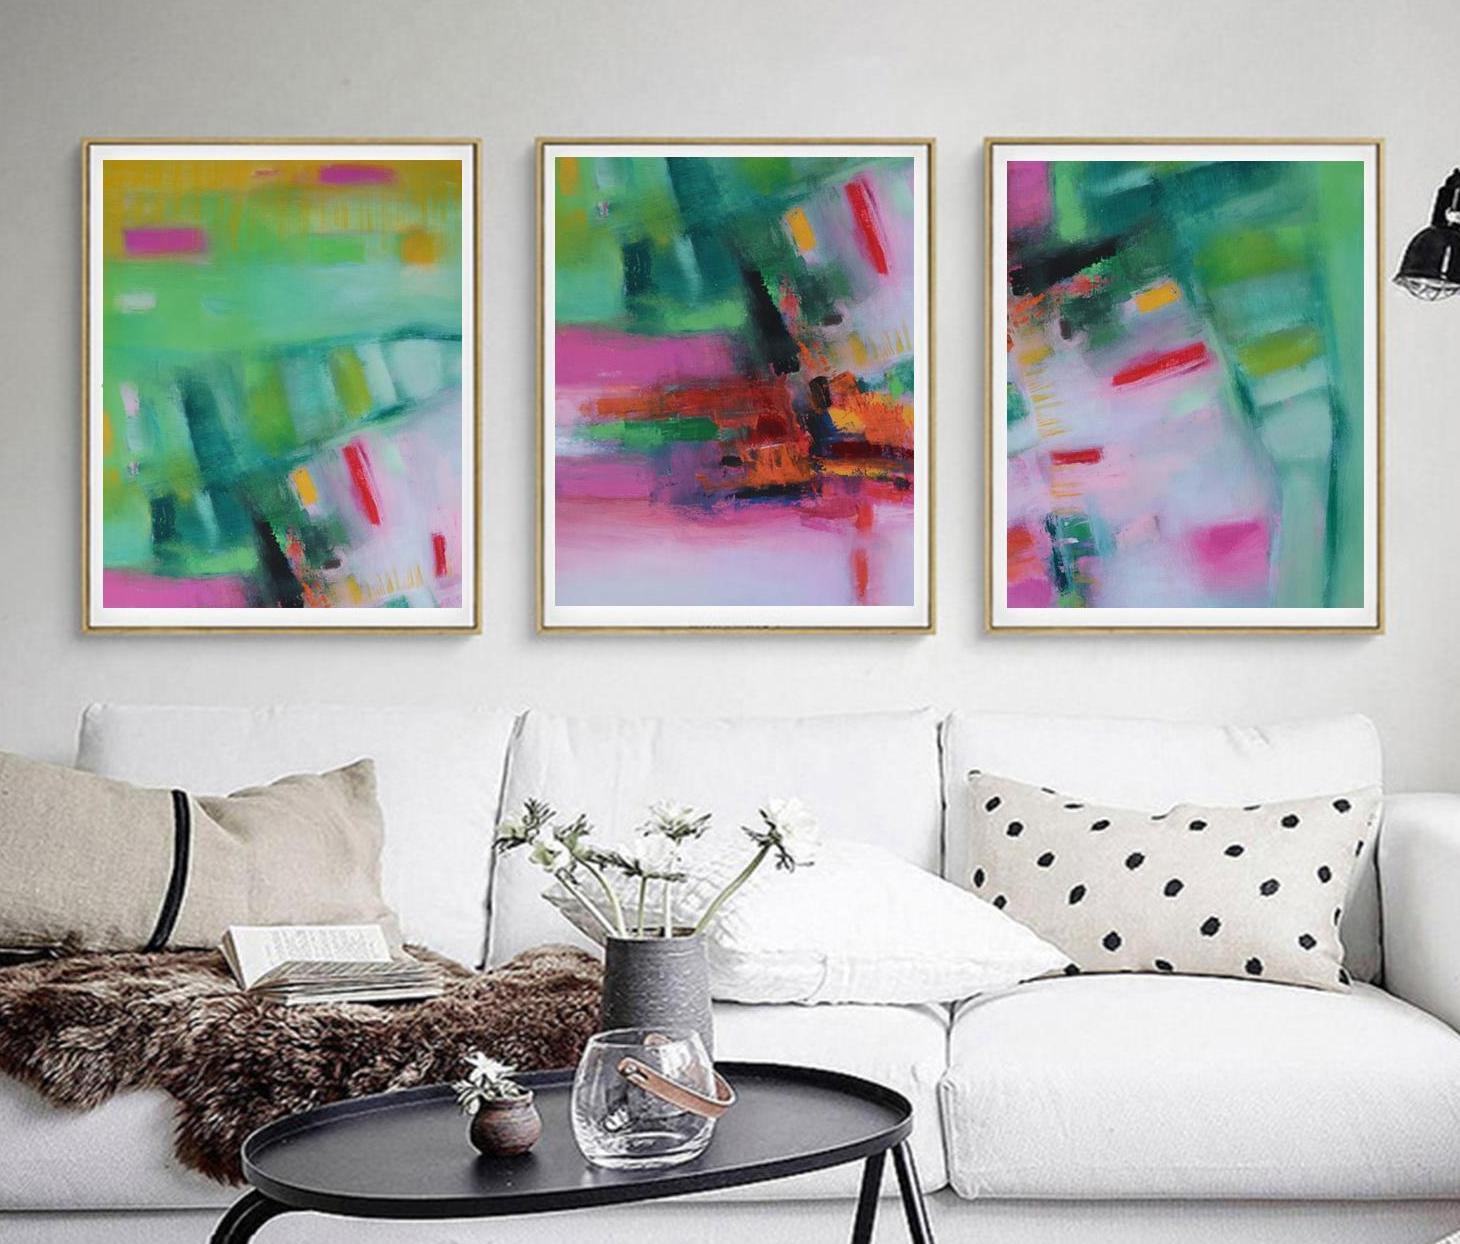 Rosa Triptychon abstrakt moderne Malerei Pastell abstrakt